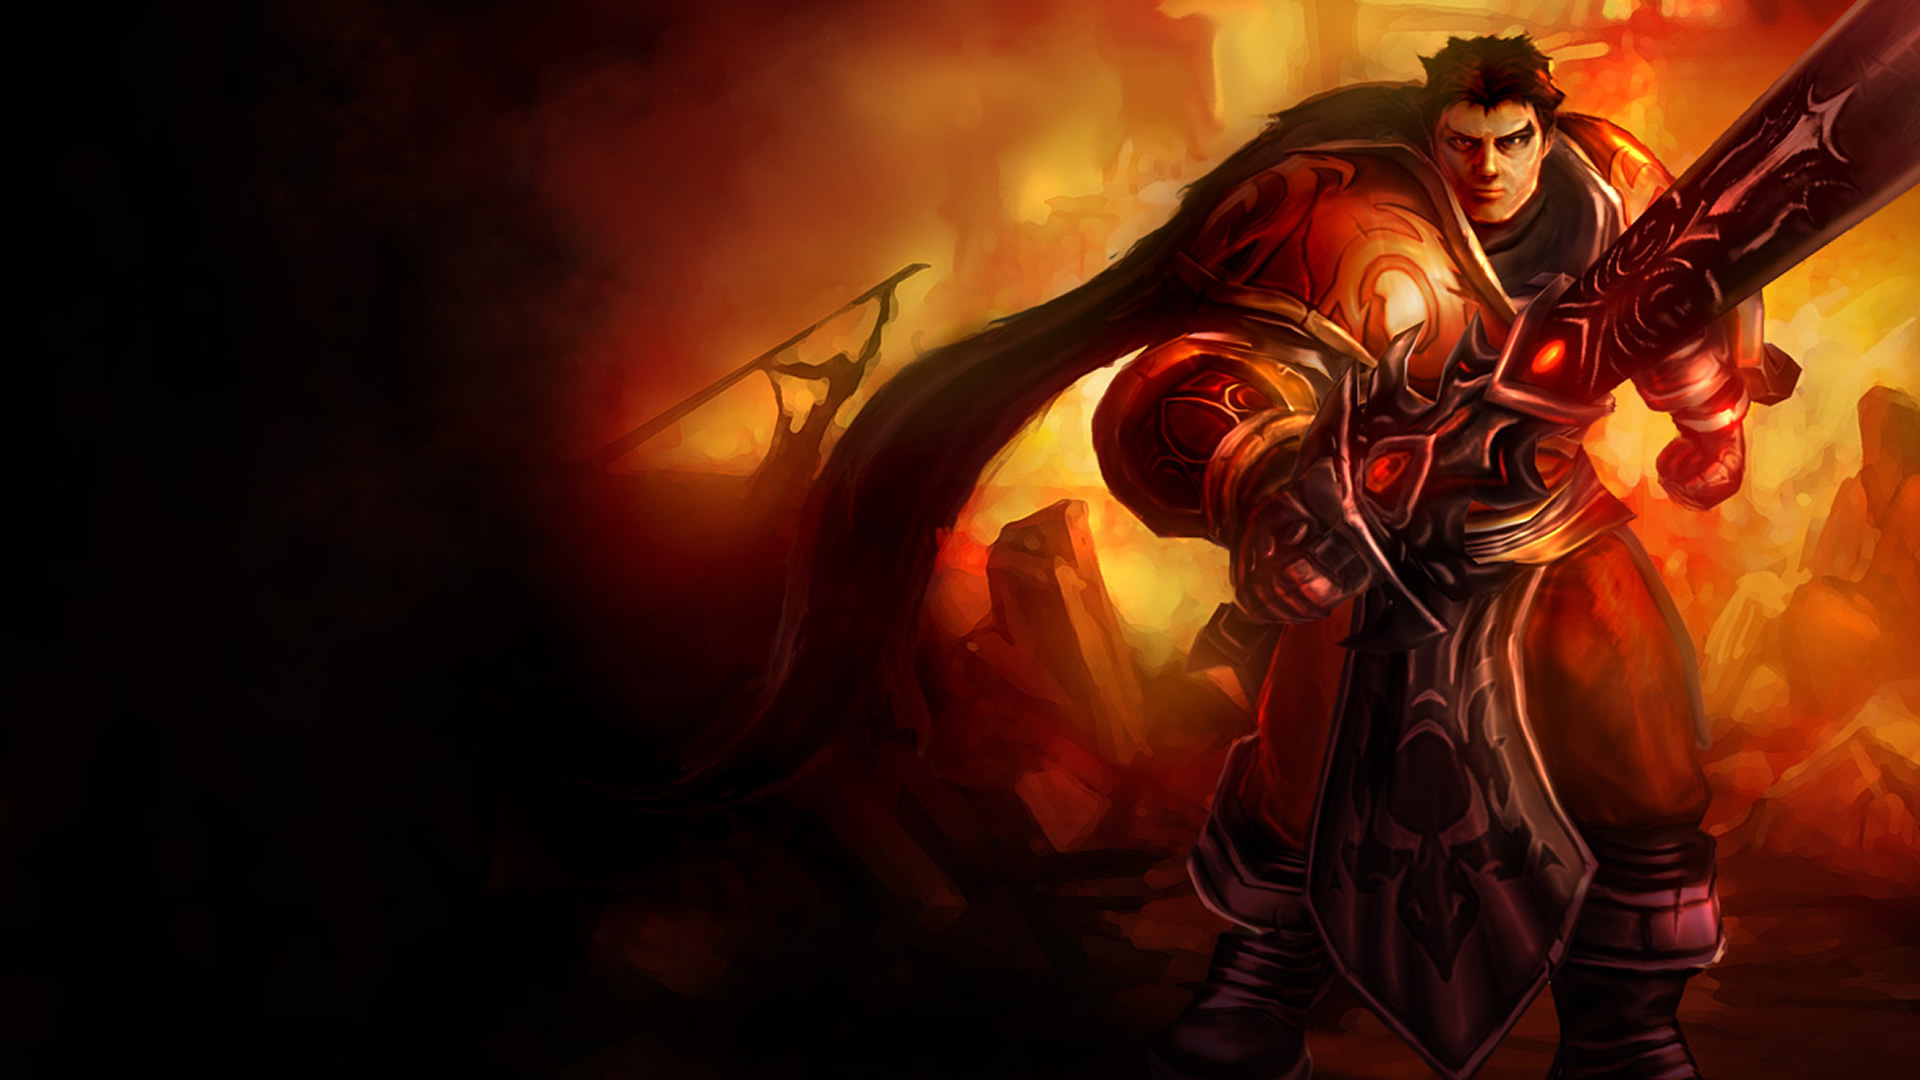 Iphone wallpaper league of legends - Jeux Vid 233 O League Of Legends Garen Fond D 233 Cran